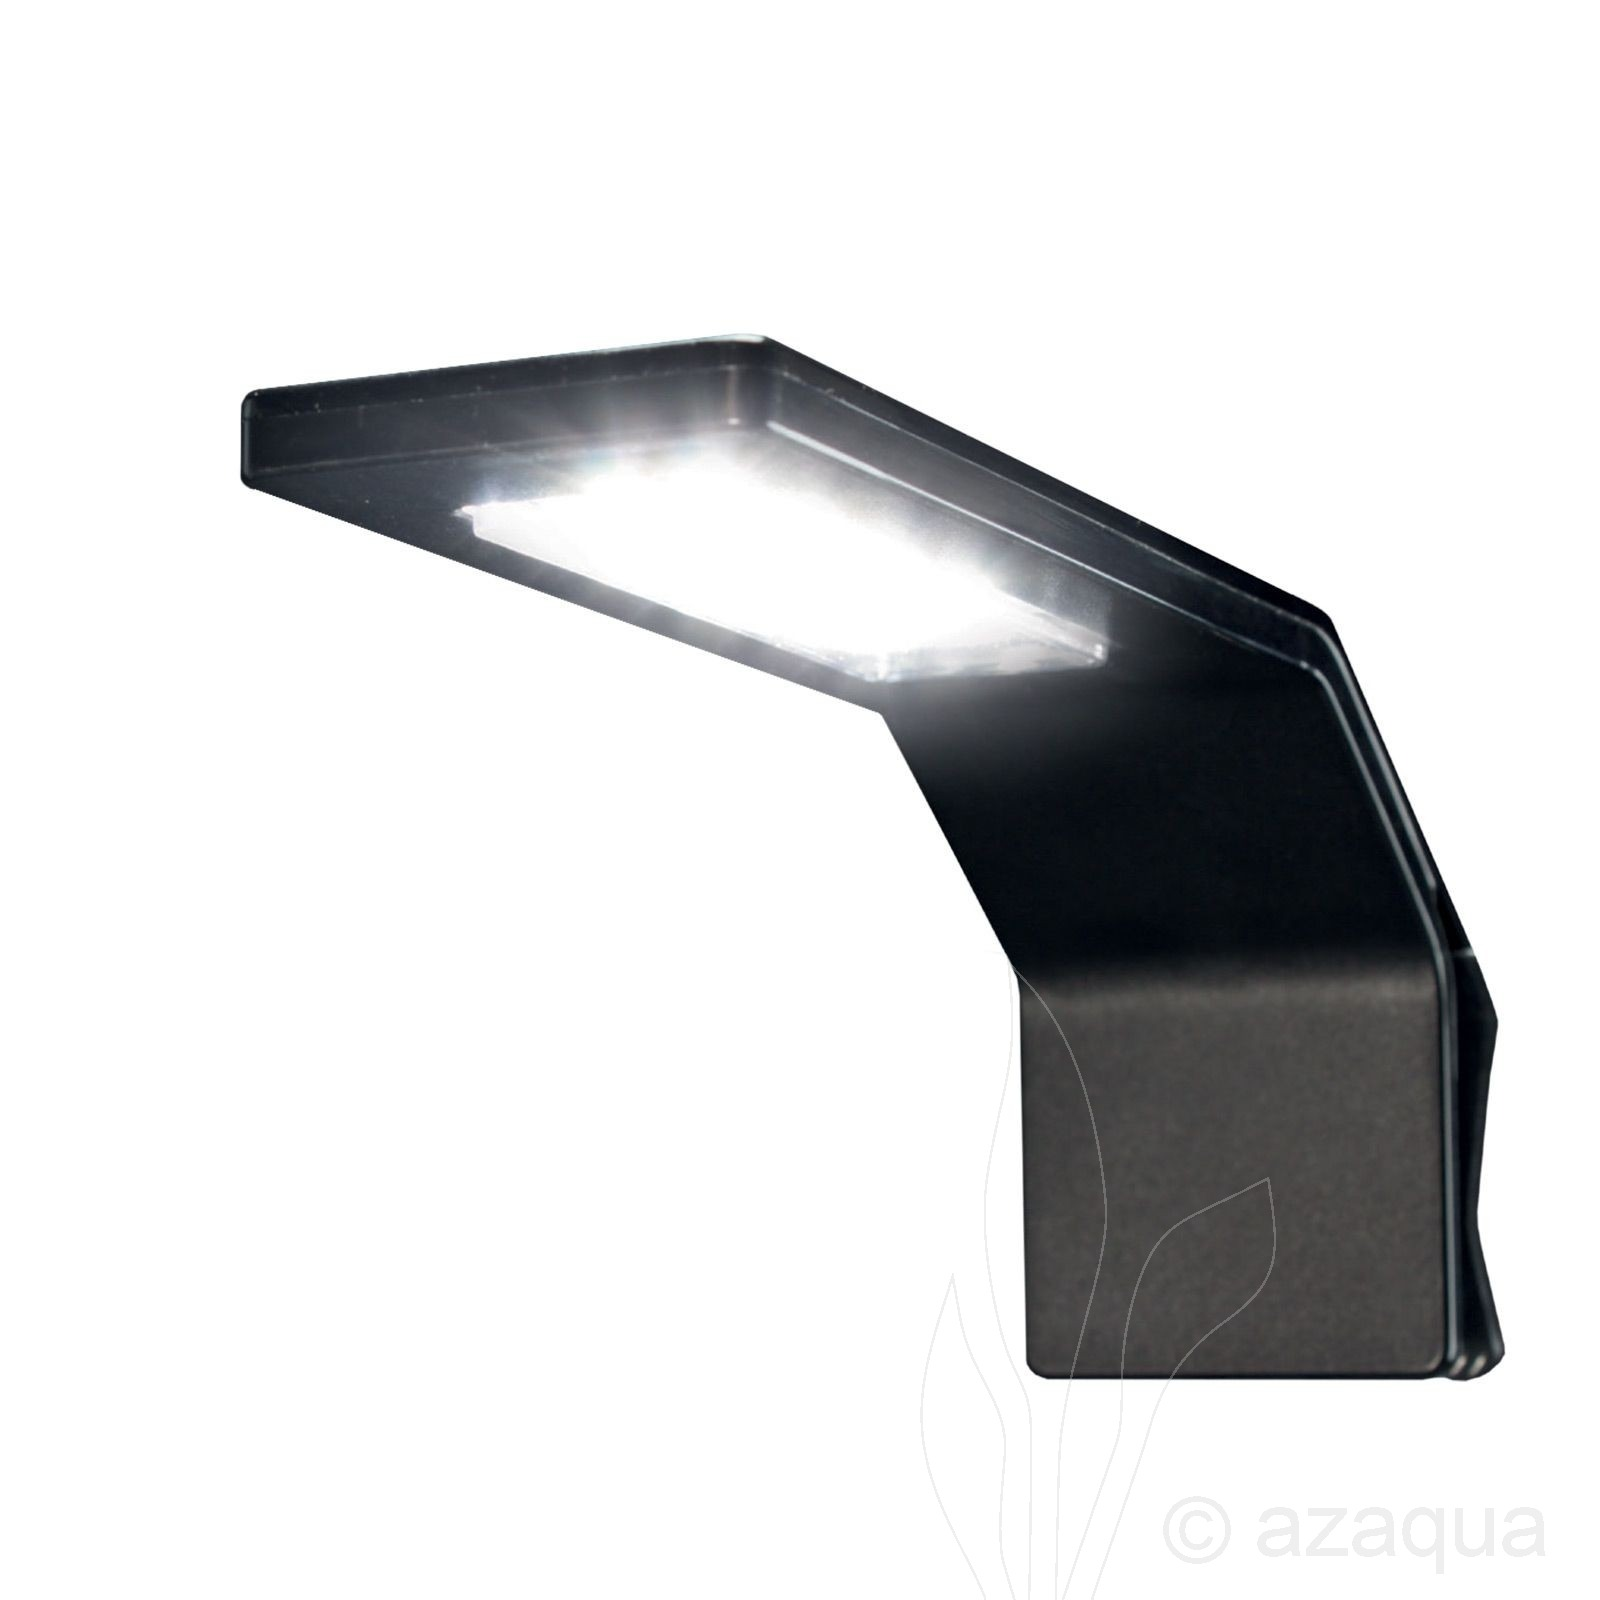 Scaper's LED